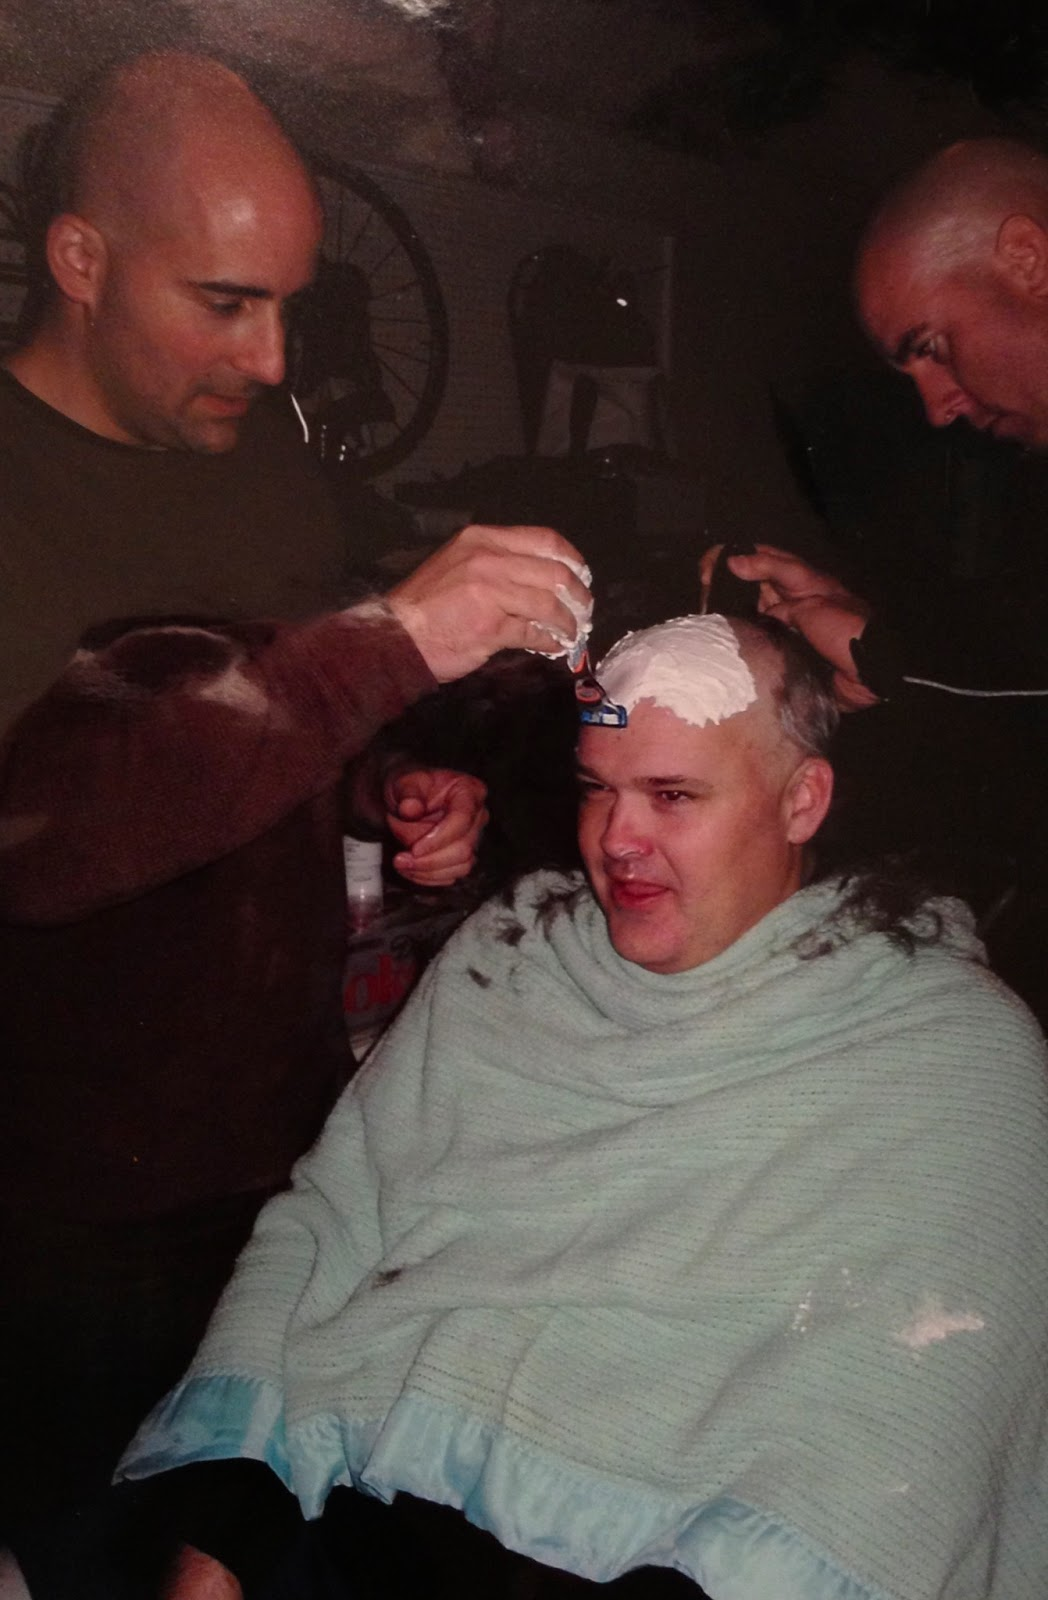 Shaved my husband